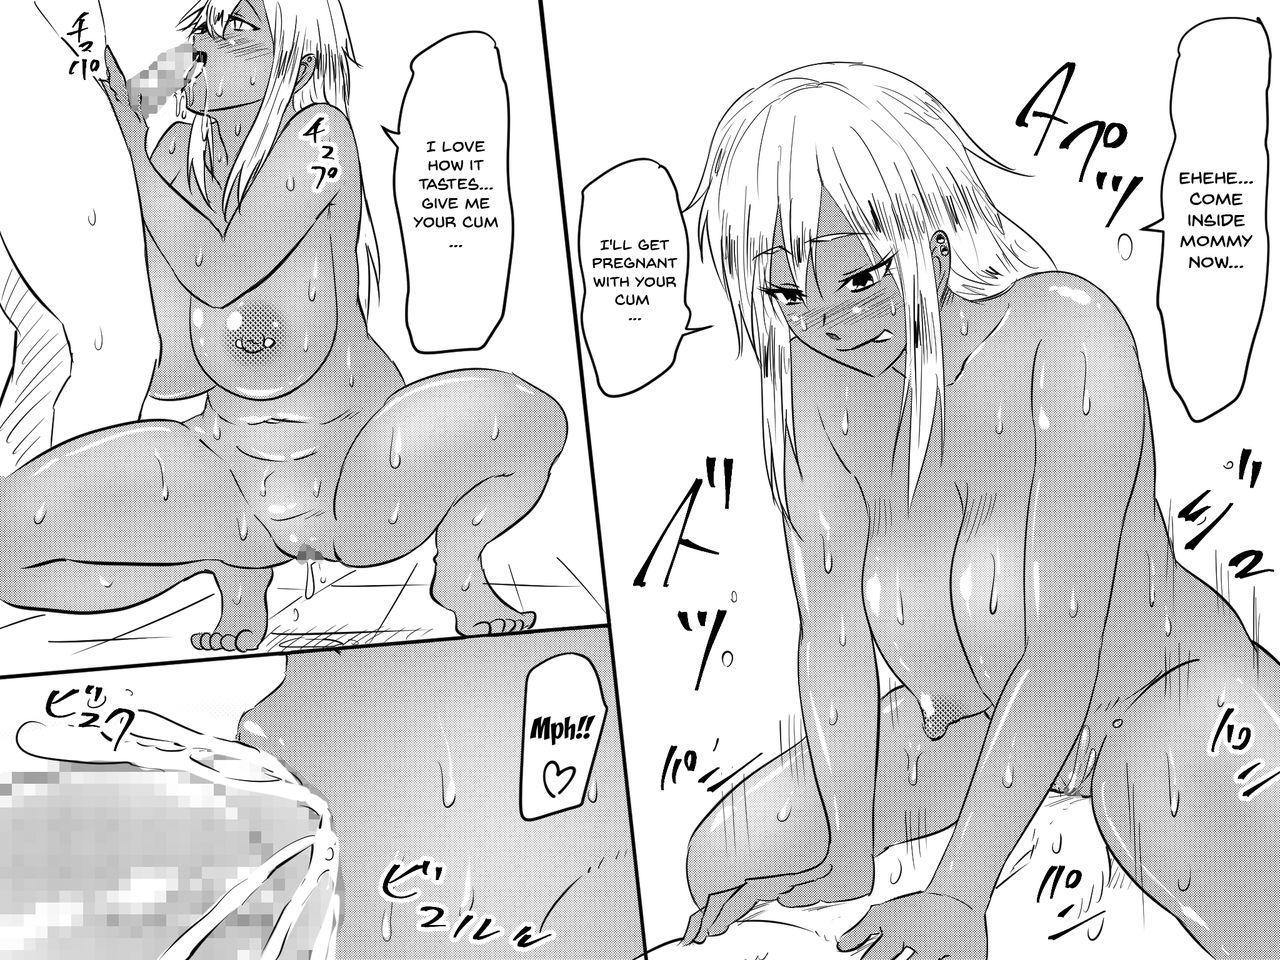 [Mikezoutei] Netorare Haha ~Kachiki de Kimottama no Okaa-san ga Boku o Ijimeru Aitsu no Onna ni Naru Hanashi~   Mom NTR ~A Story Of How My Gutsy Mom Ended Up Becoming My Bully's Plaything~ [English] {Doujins.com} 76